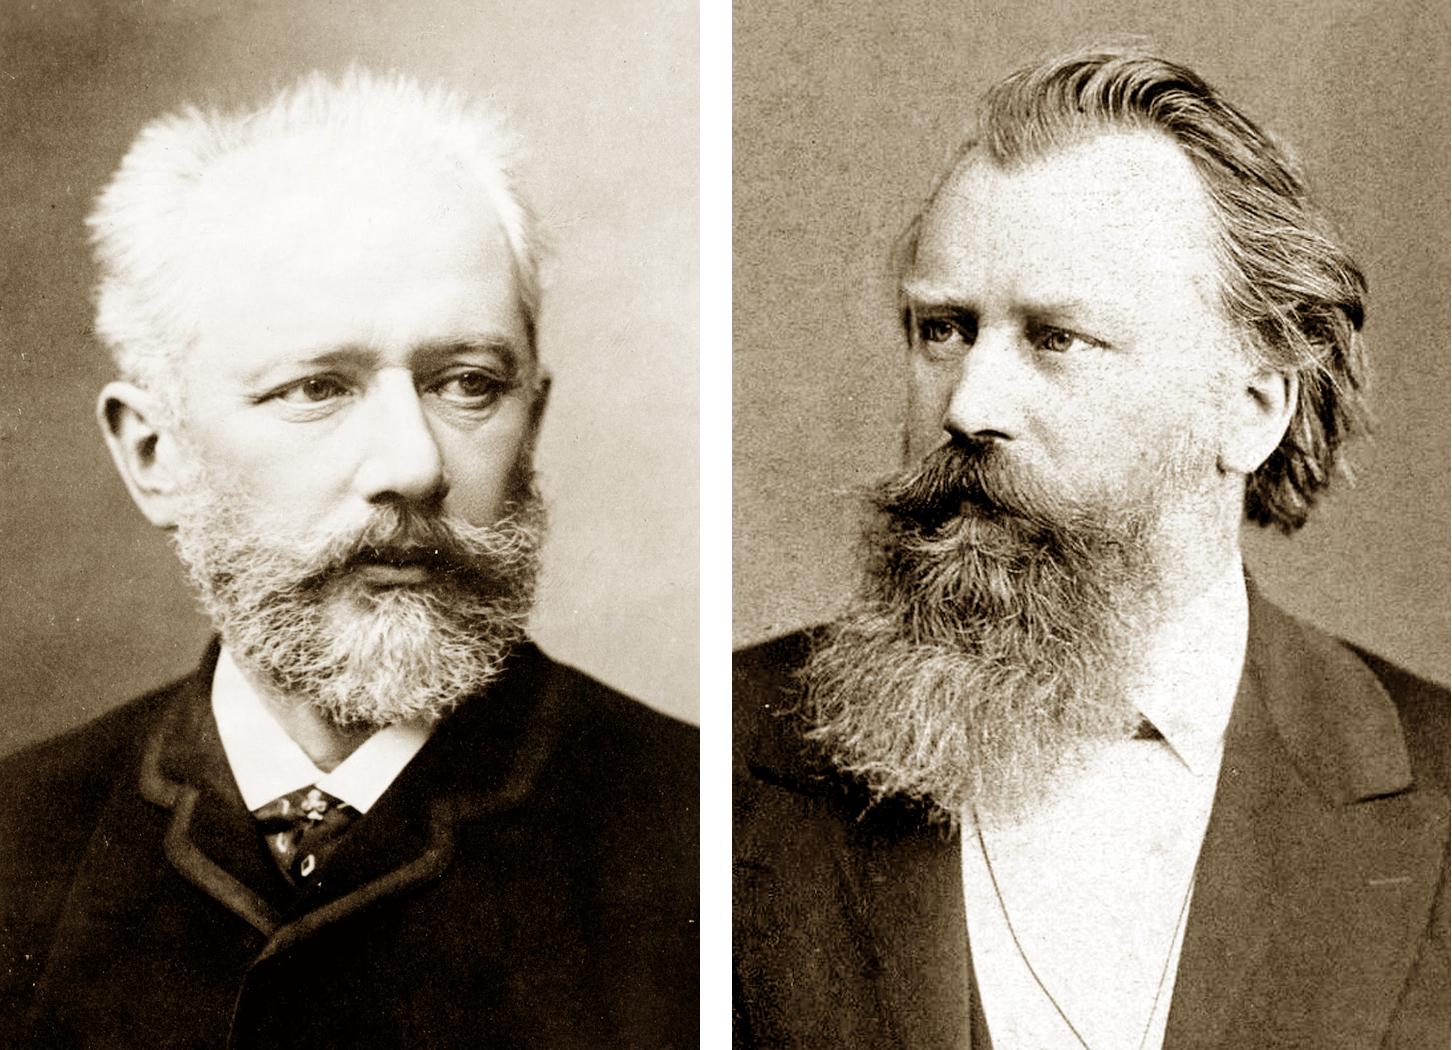 Johannes and Piotr